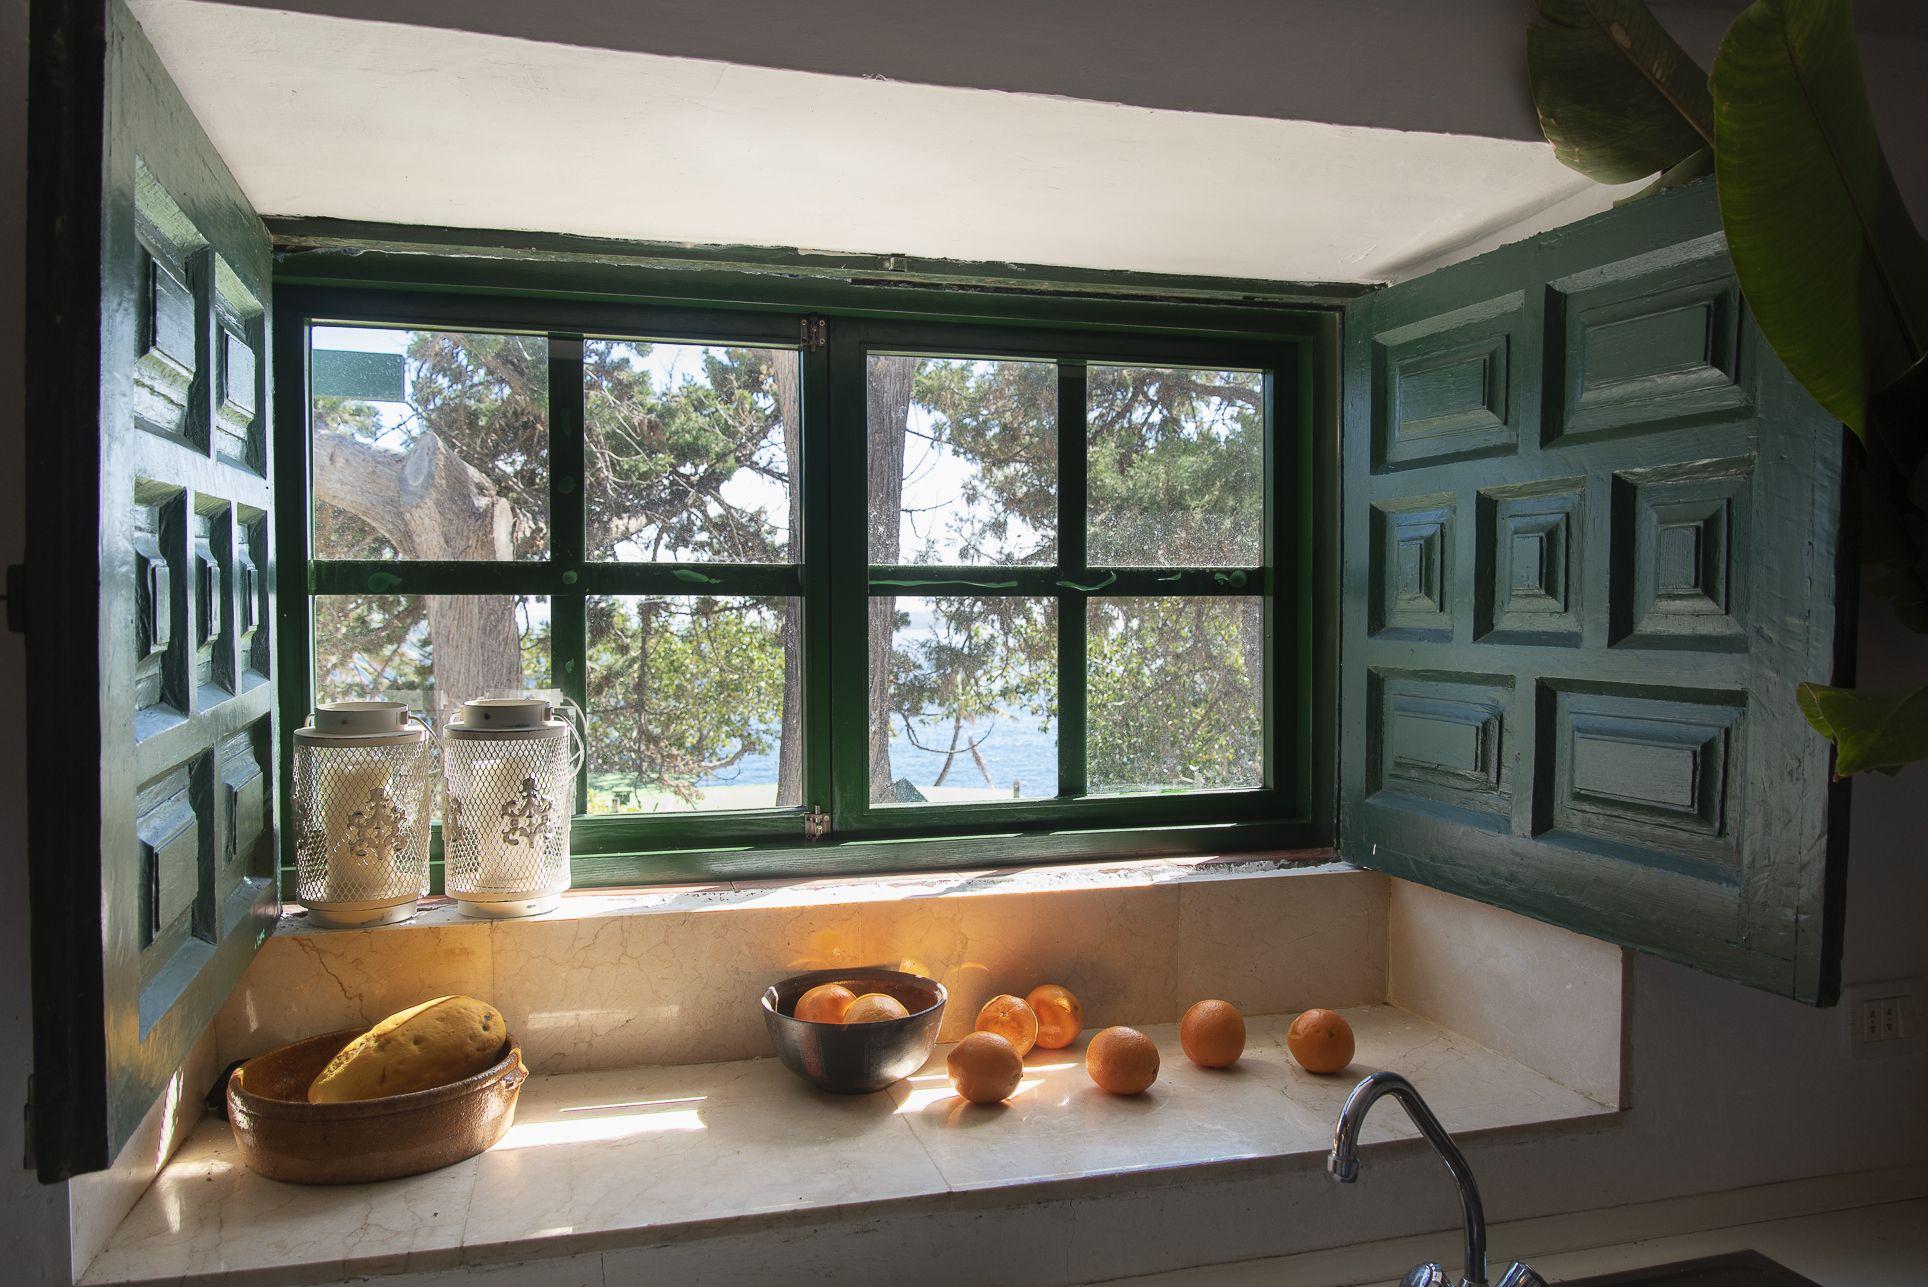 La Casa del Laurel - Ventana de la cocina